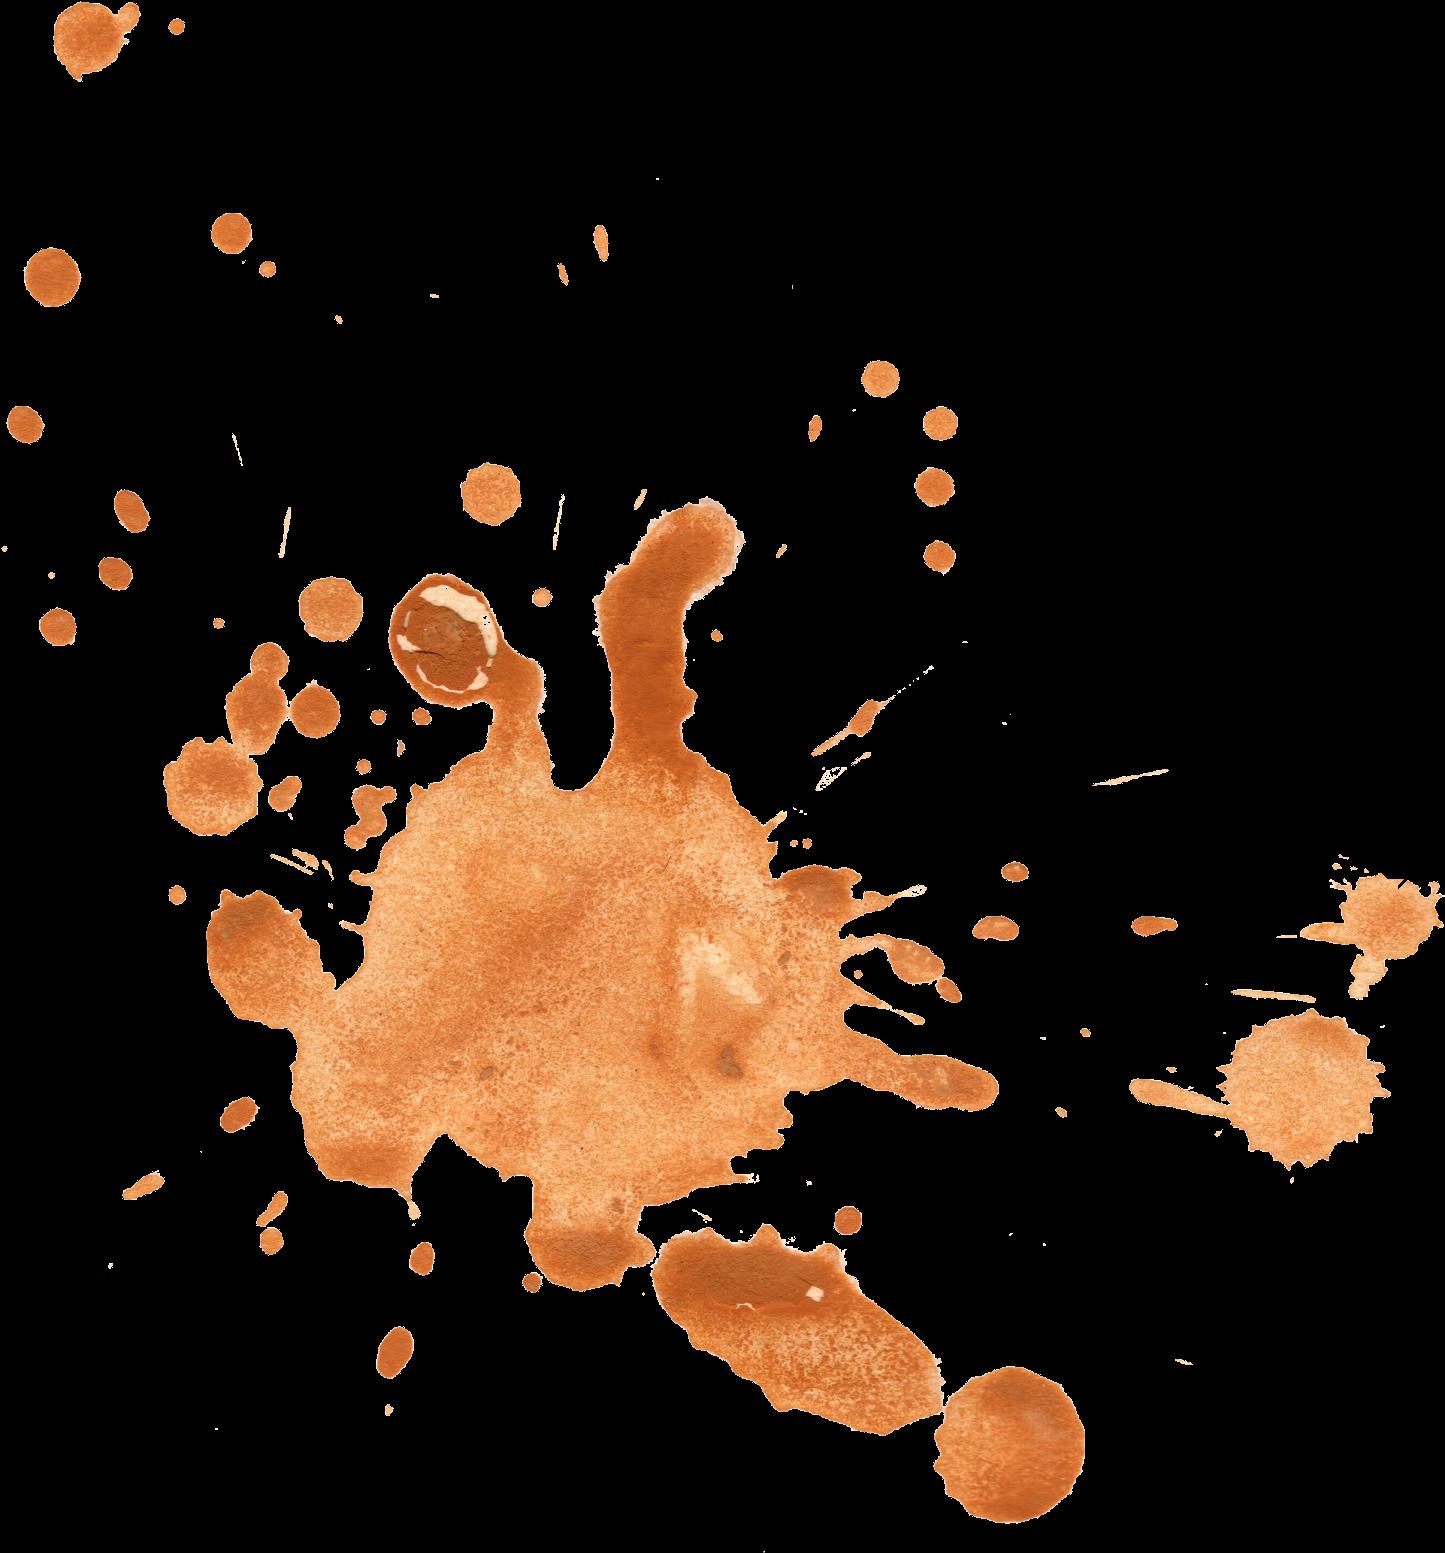 Clip Art Transparent Library Watercolor Splatter Png - Orange Watercolor Splash Png (1568x1623), Png Download